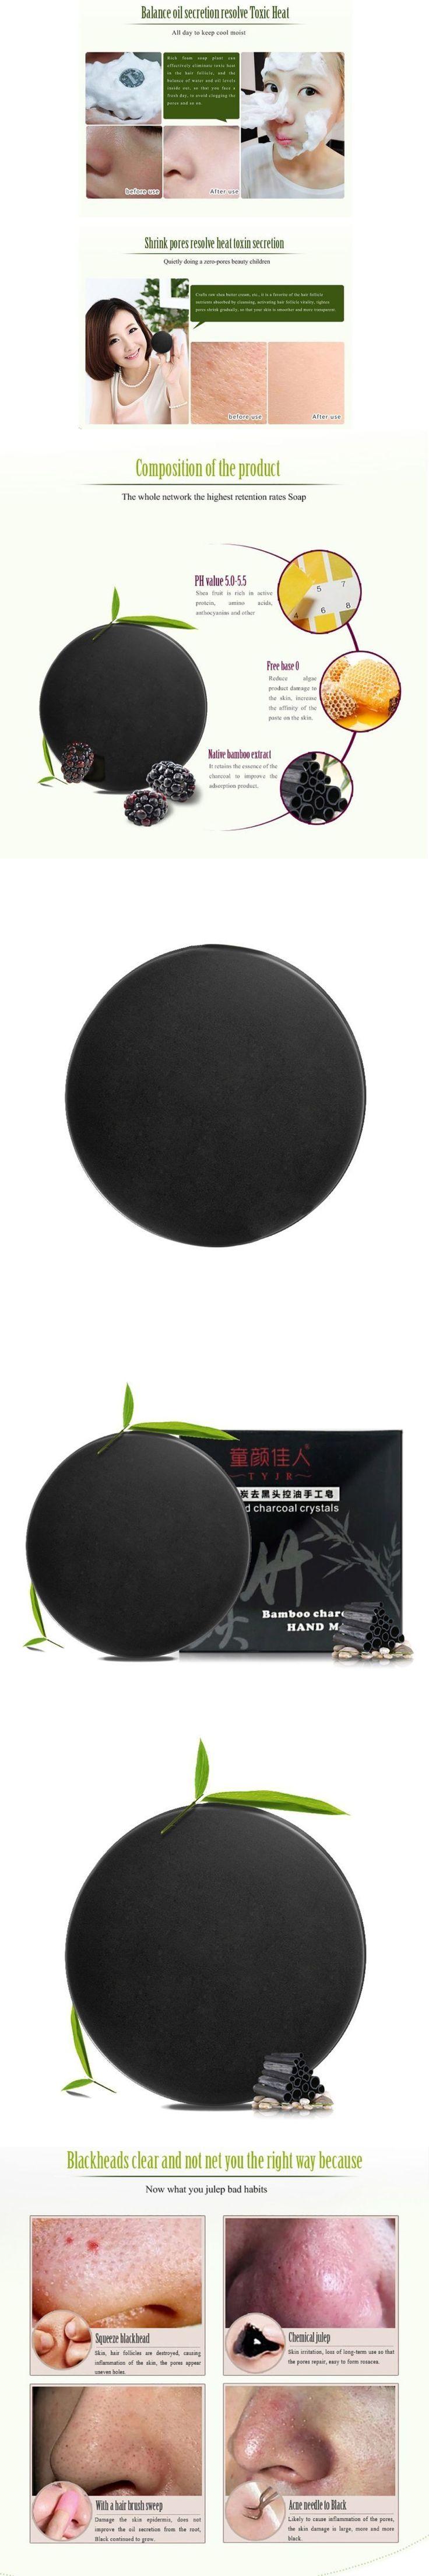 BTG 2017 skin care natural Skin whitening soap blackhead remover acne treatment Bamboo charcoal handmade soap Treatment #Treatingskindarkspots #naturalskinwhitening